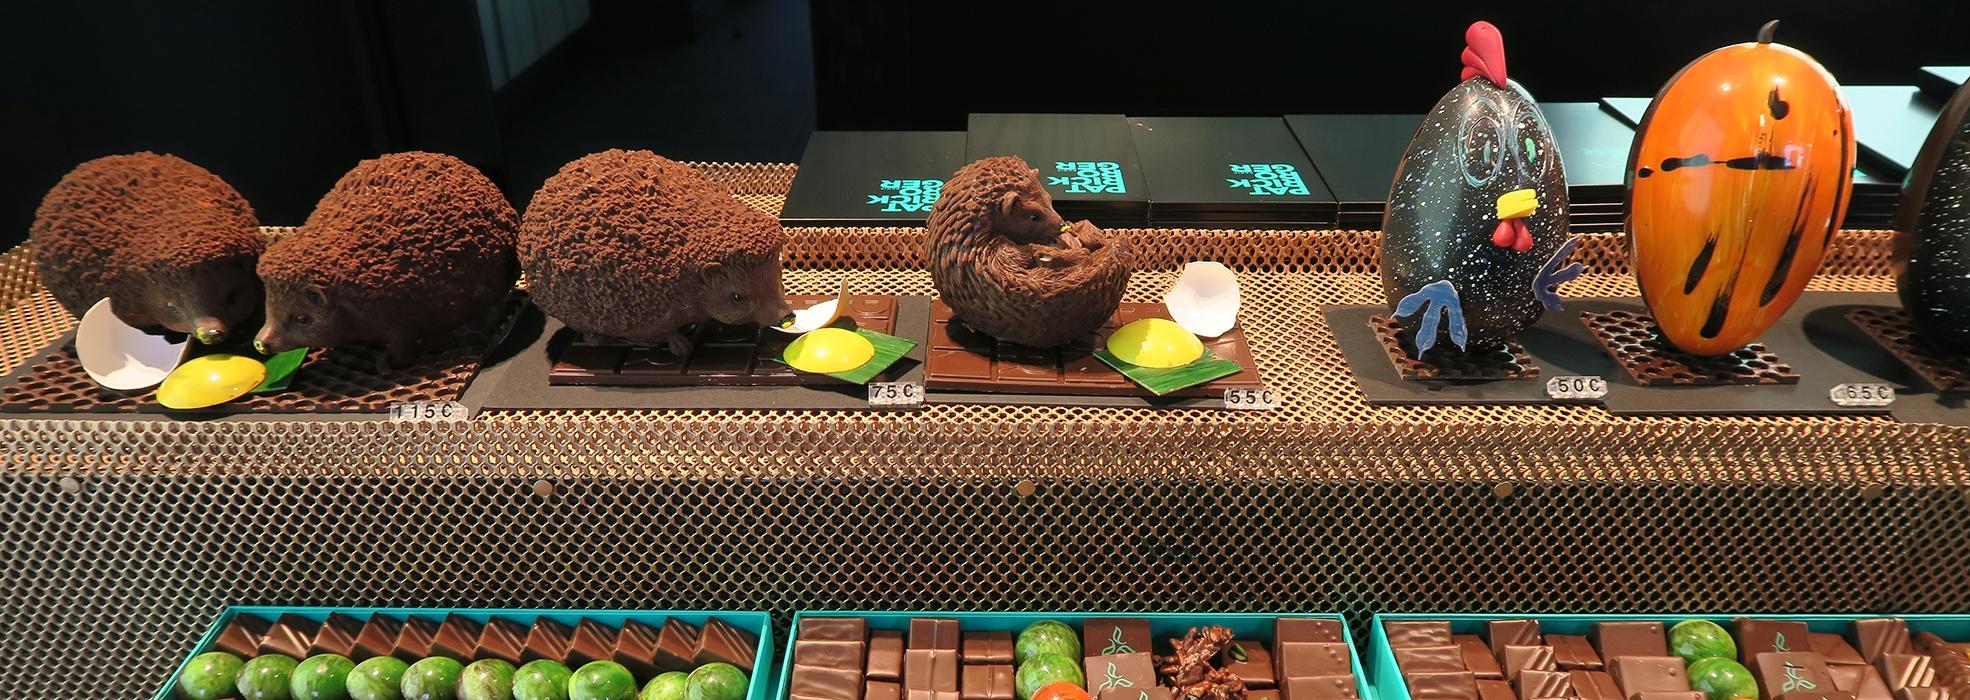 Huevos de chocolate de Pasquas en París